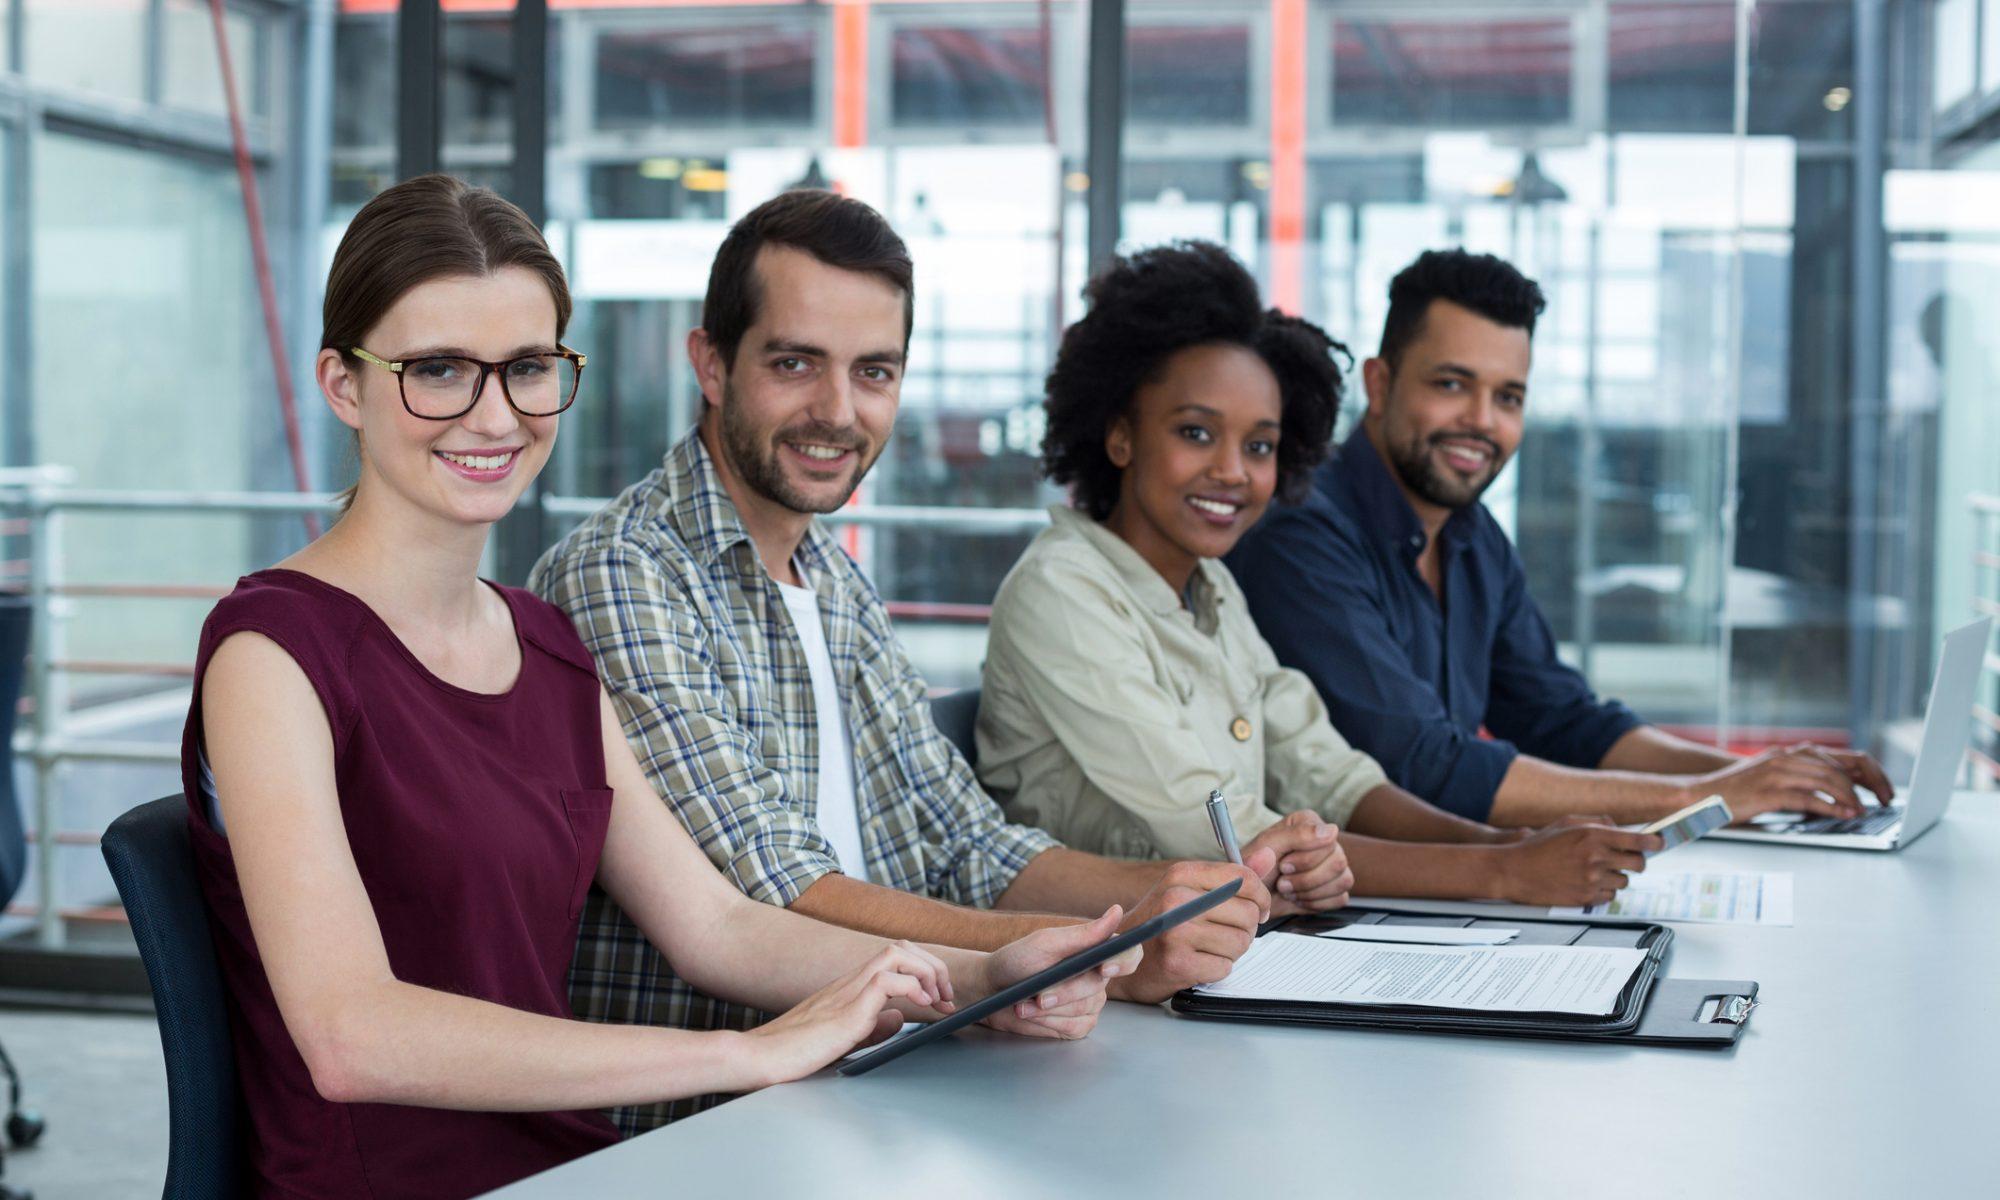 Wayfinders Business Co-operative